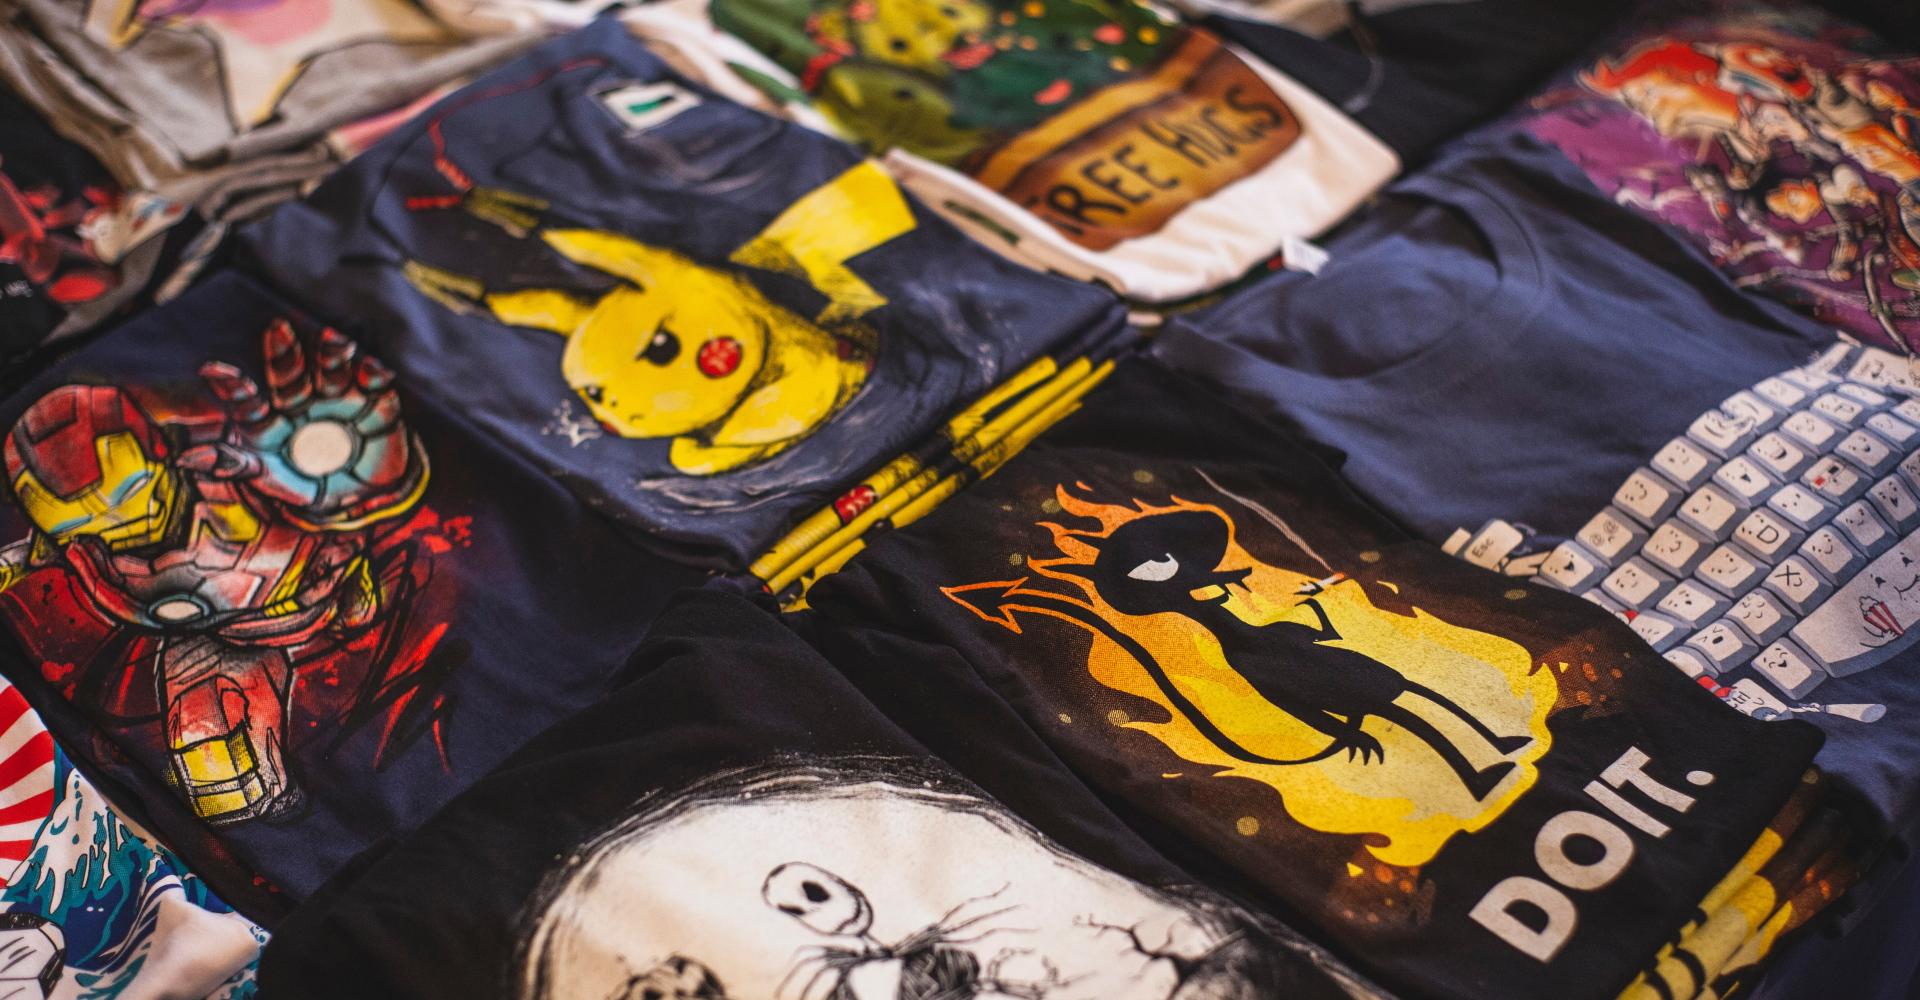 market-shirts-shop-2294342a